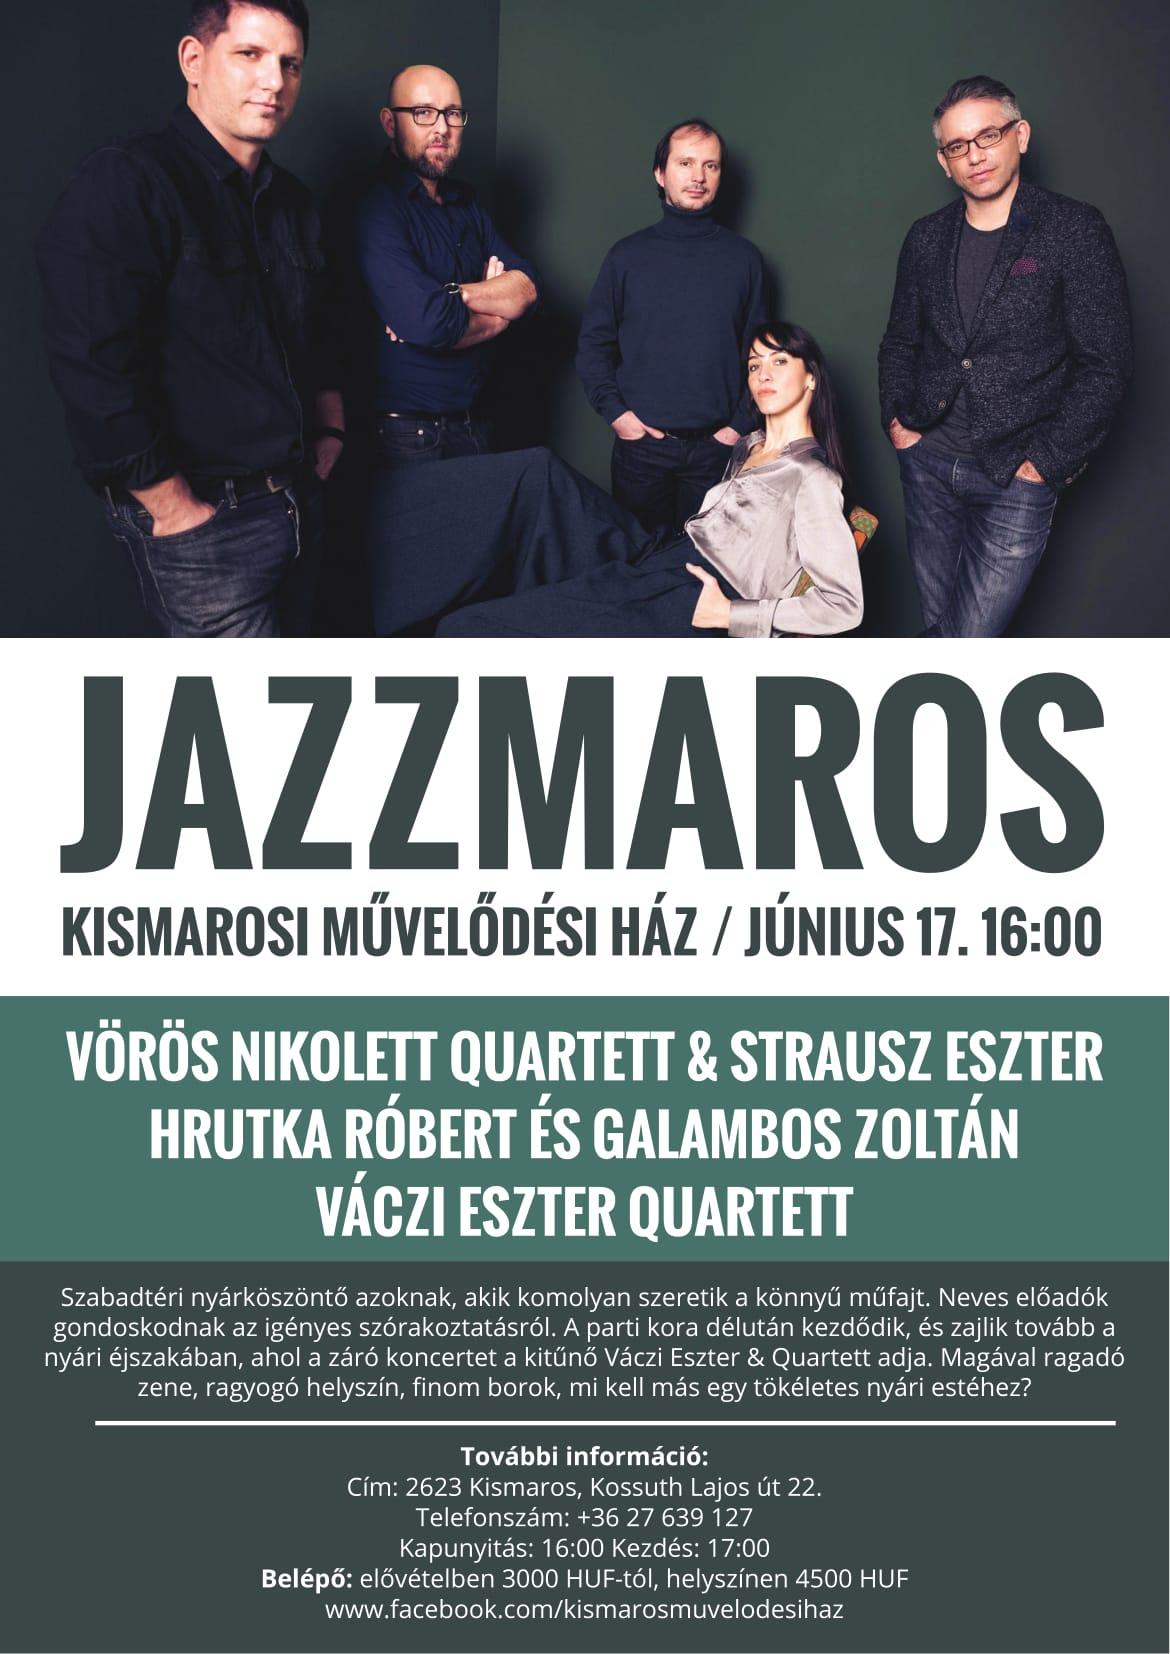 jazzmaros_flyer-1